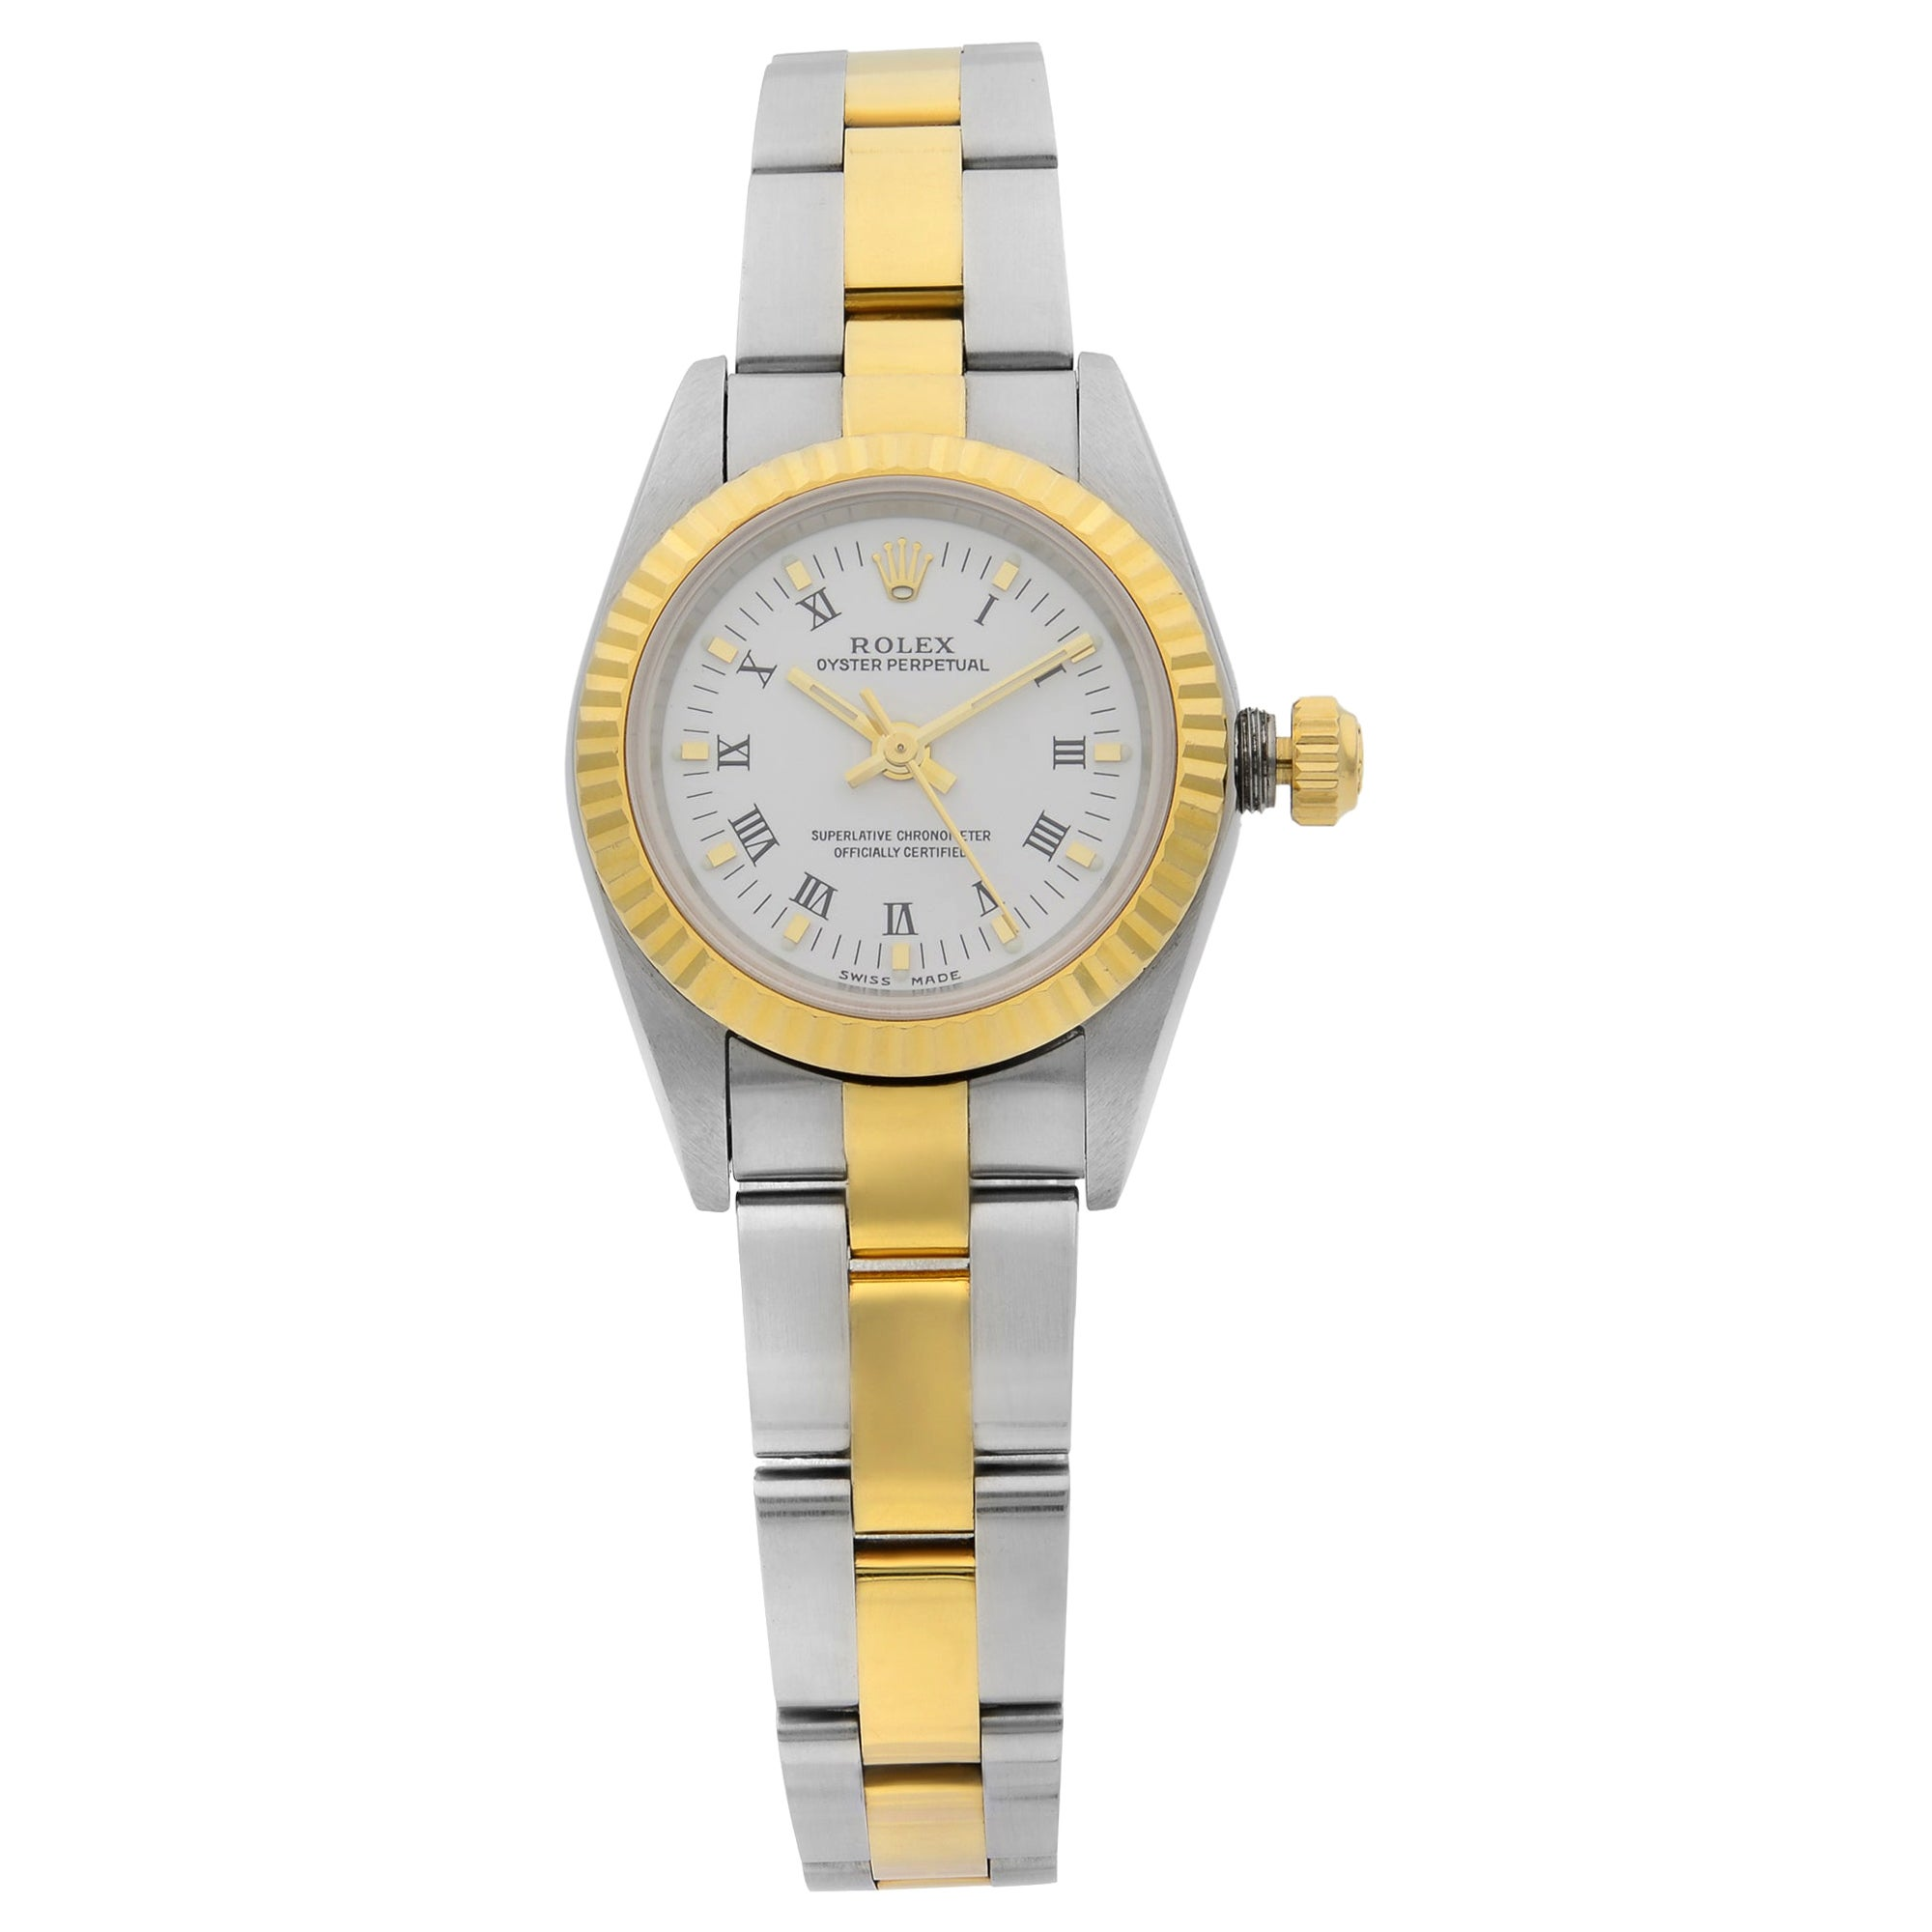 Rolex Oyster Perpetual 18 Karat Gold Steel White Roman Dial Ladies Watch 76193